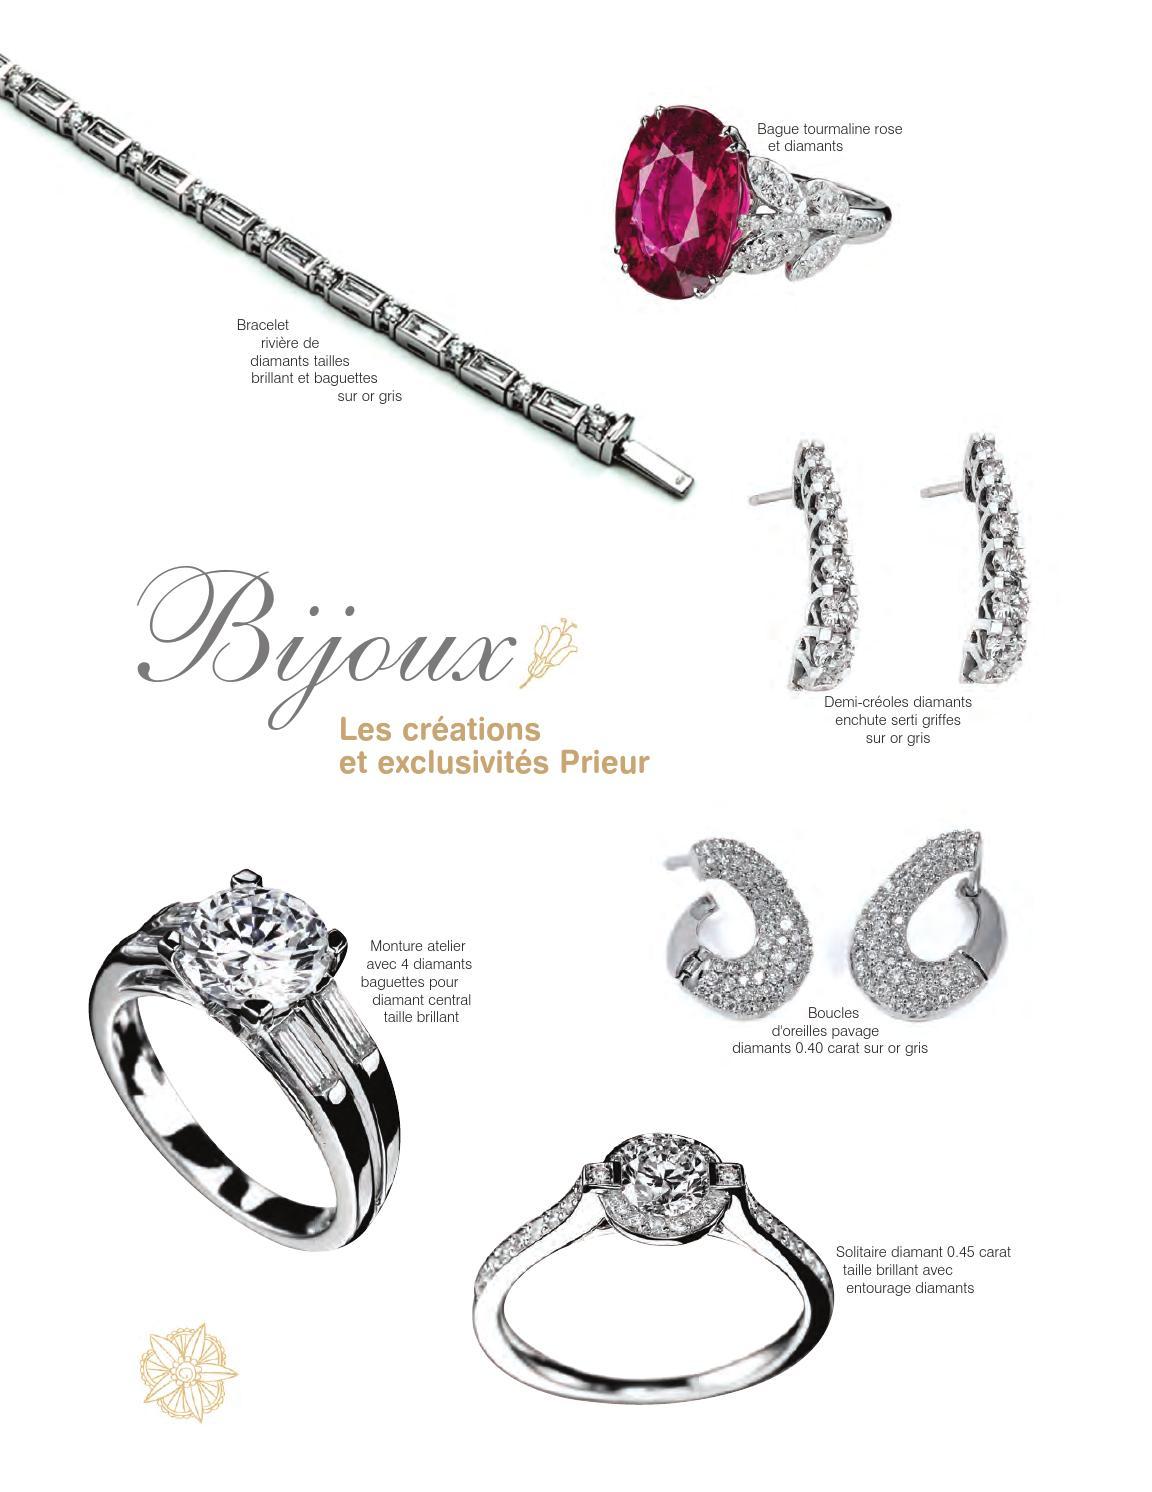 f0059e257ab07 Prieur 1 by Egerie Magazine - issuu